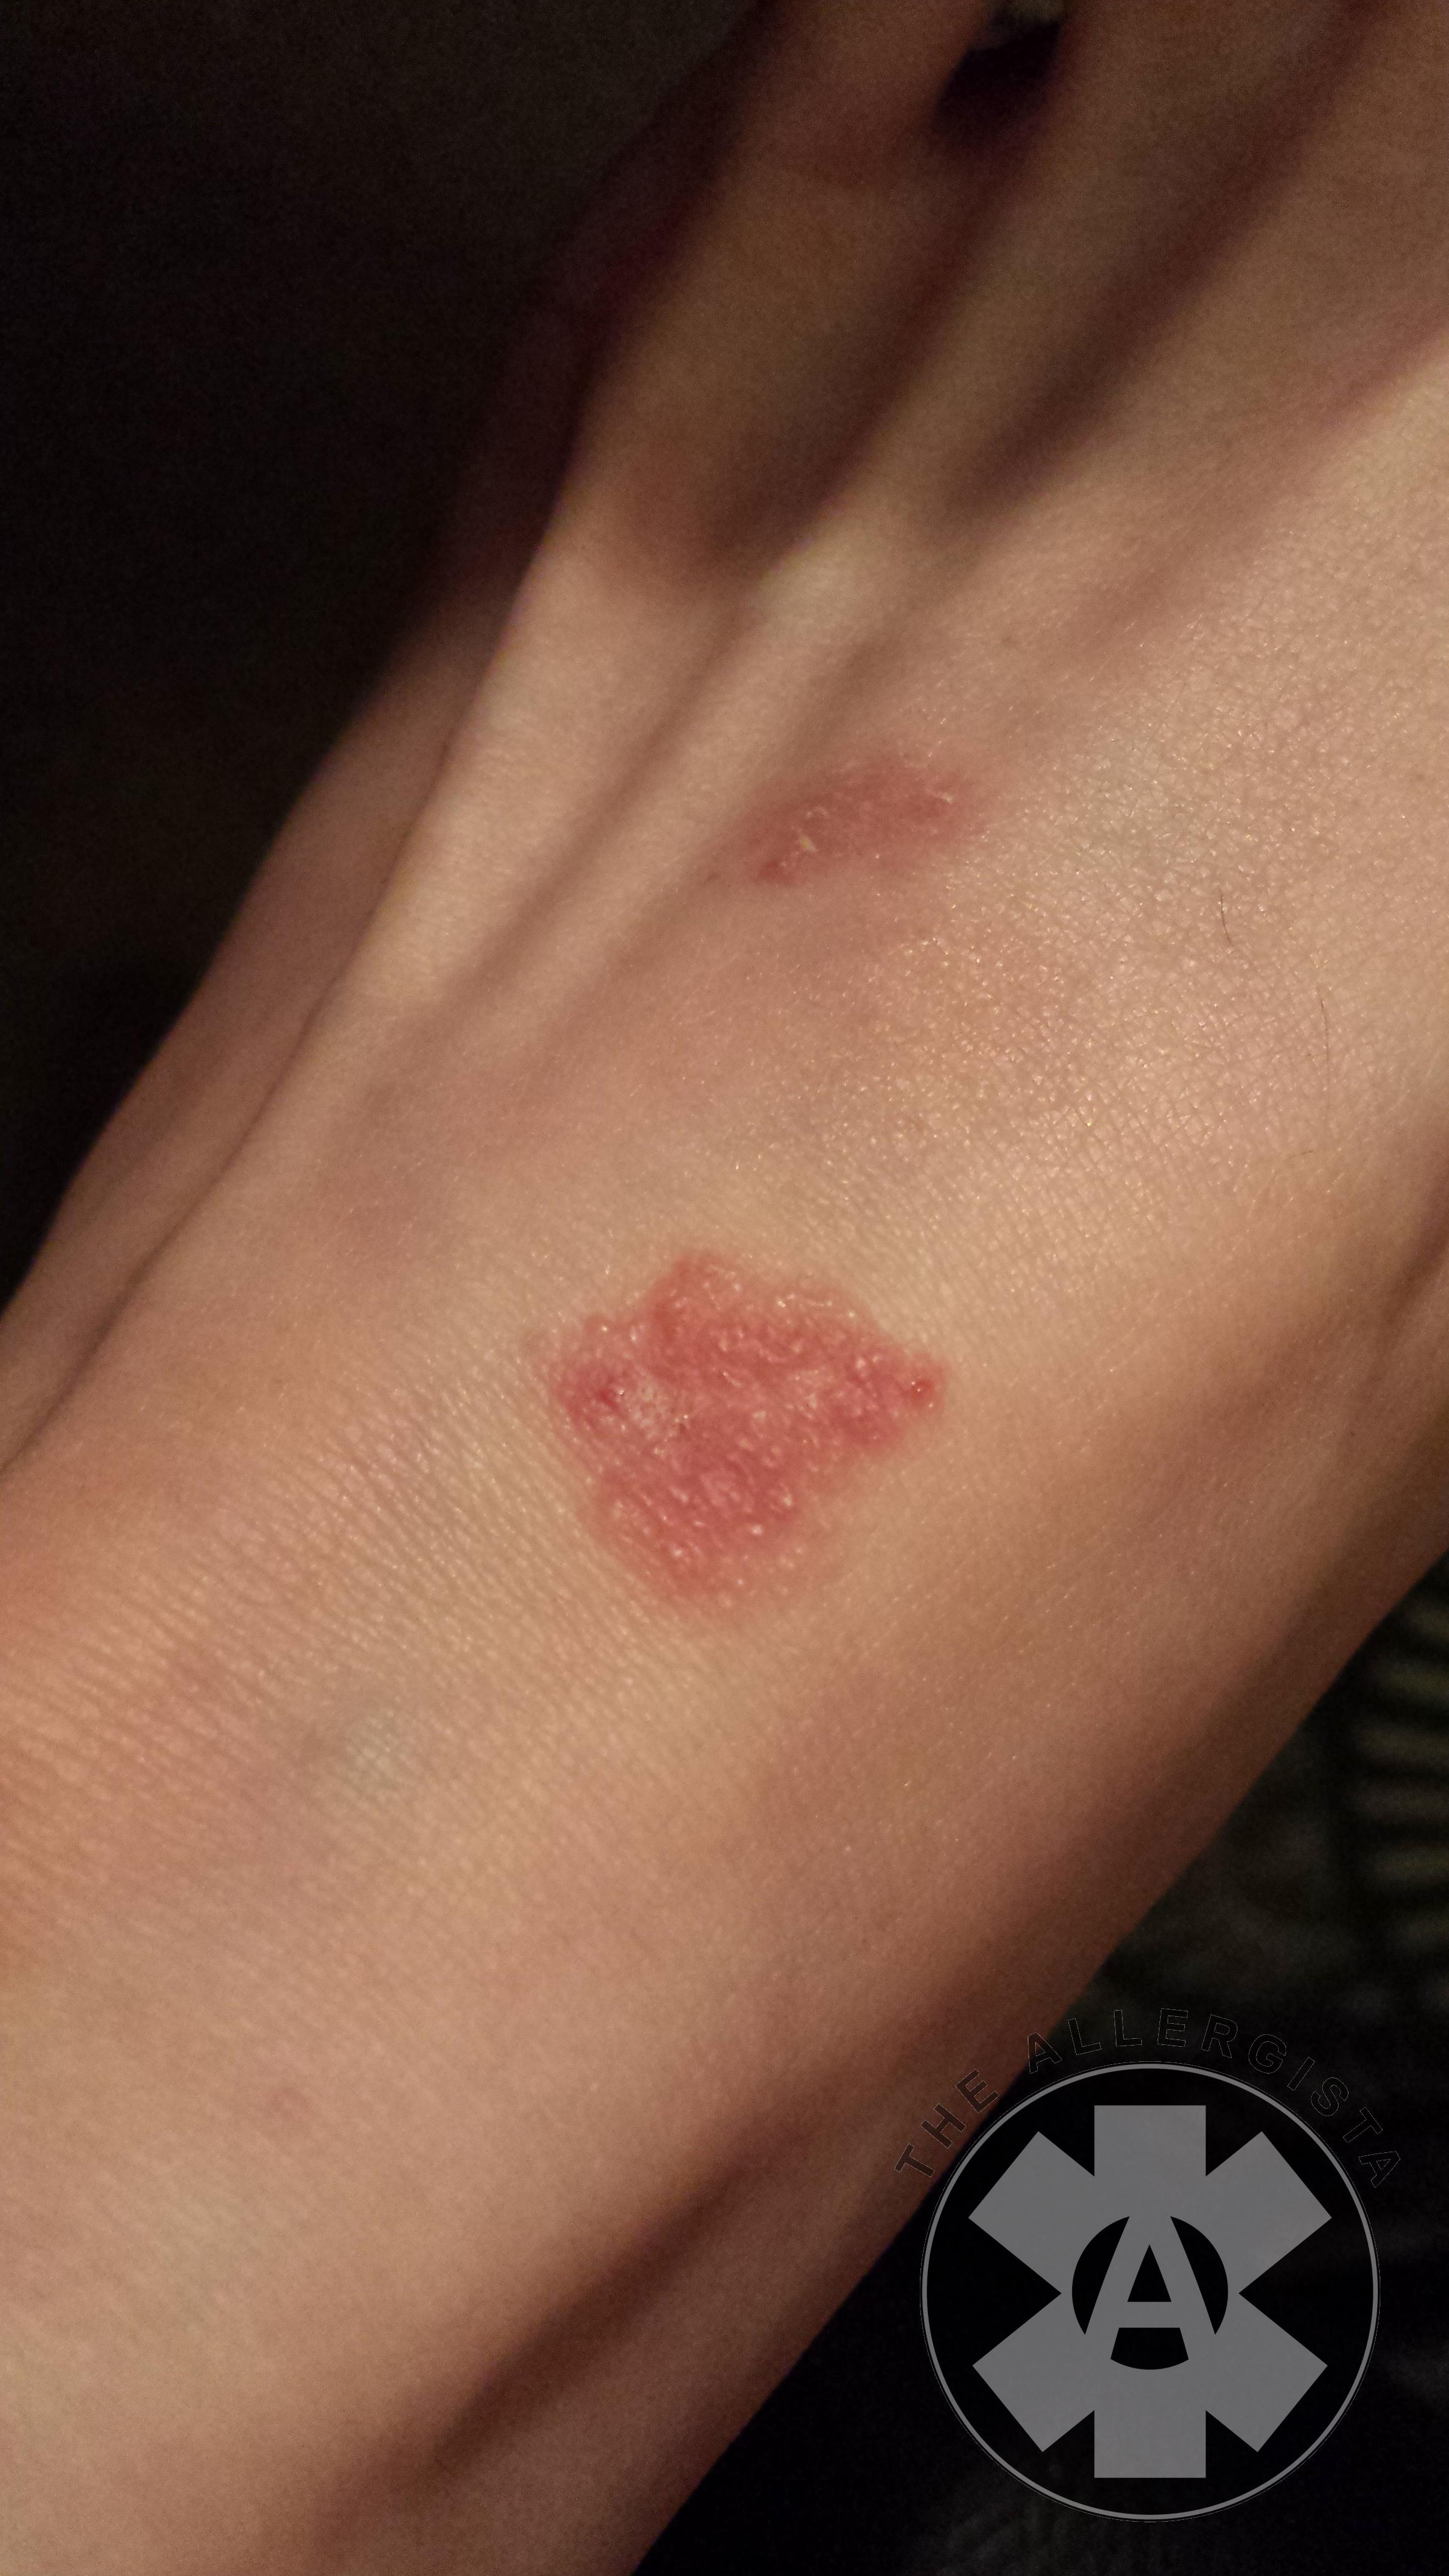 Why Do I Suddenly Have Dermatitis